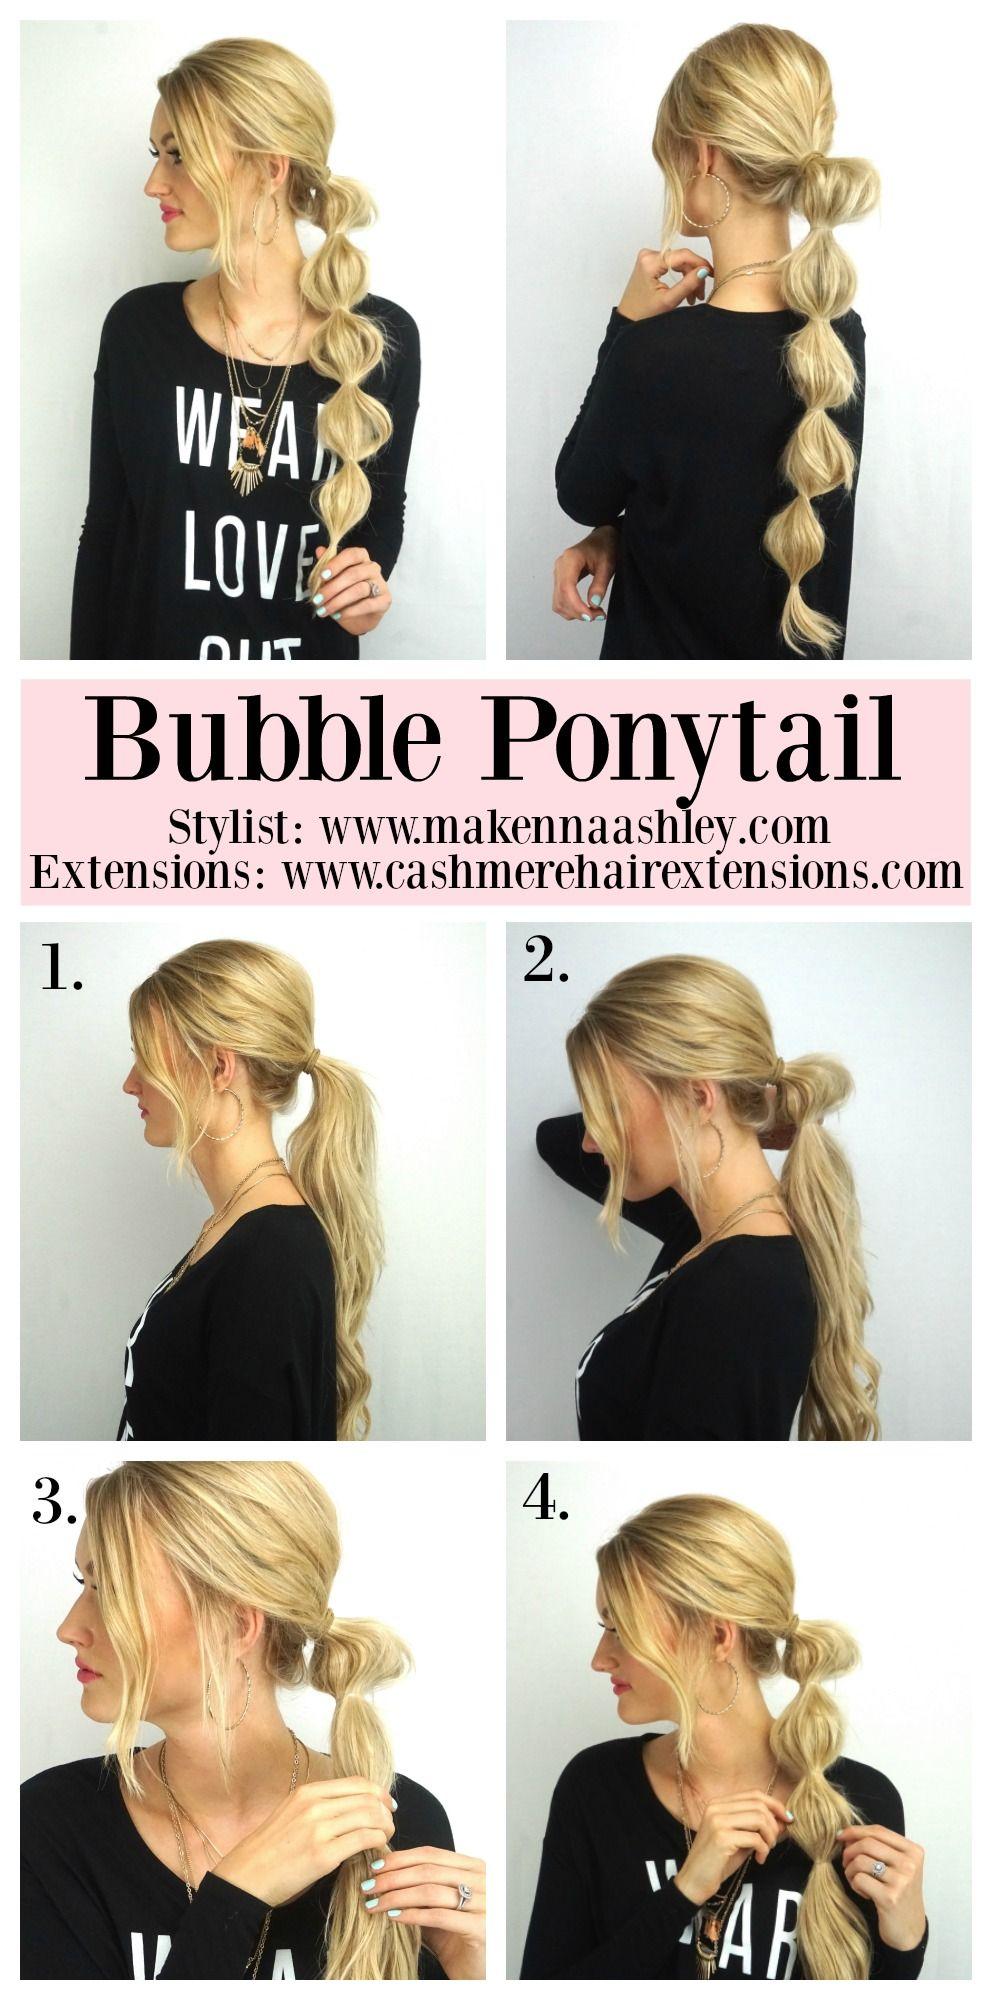 Bubble Ponytail Tutorial hairstyles Pinterest